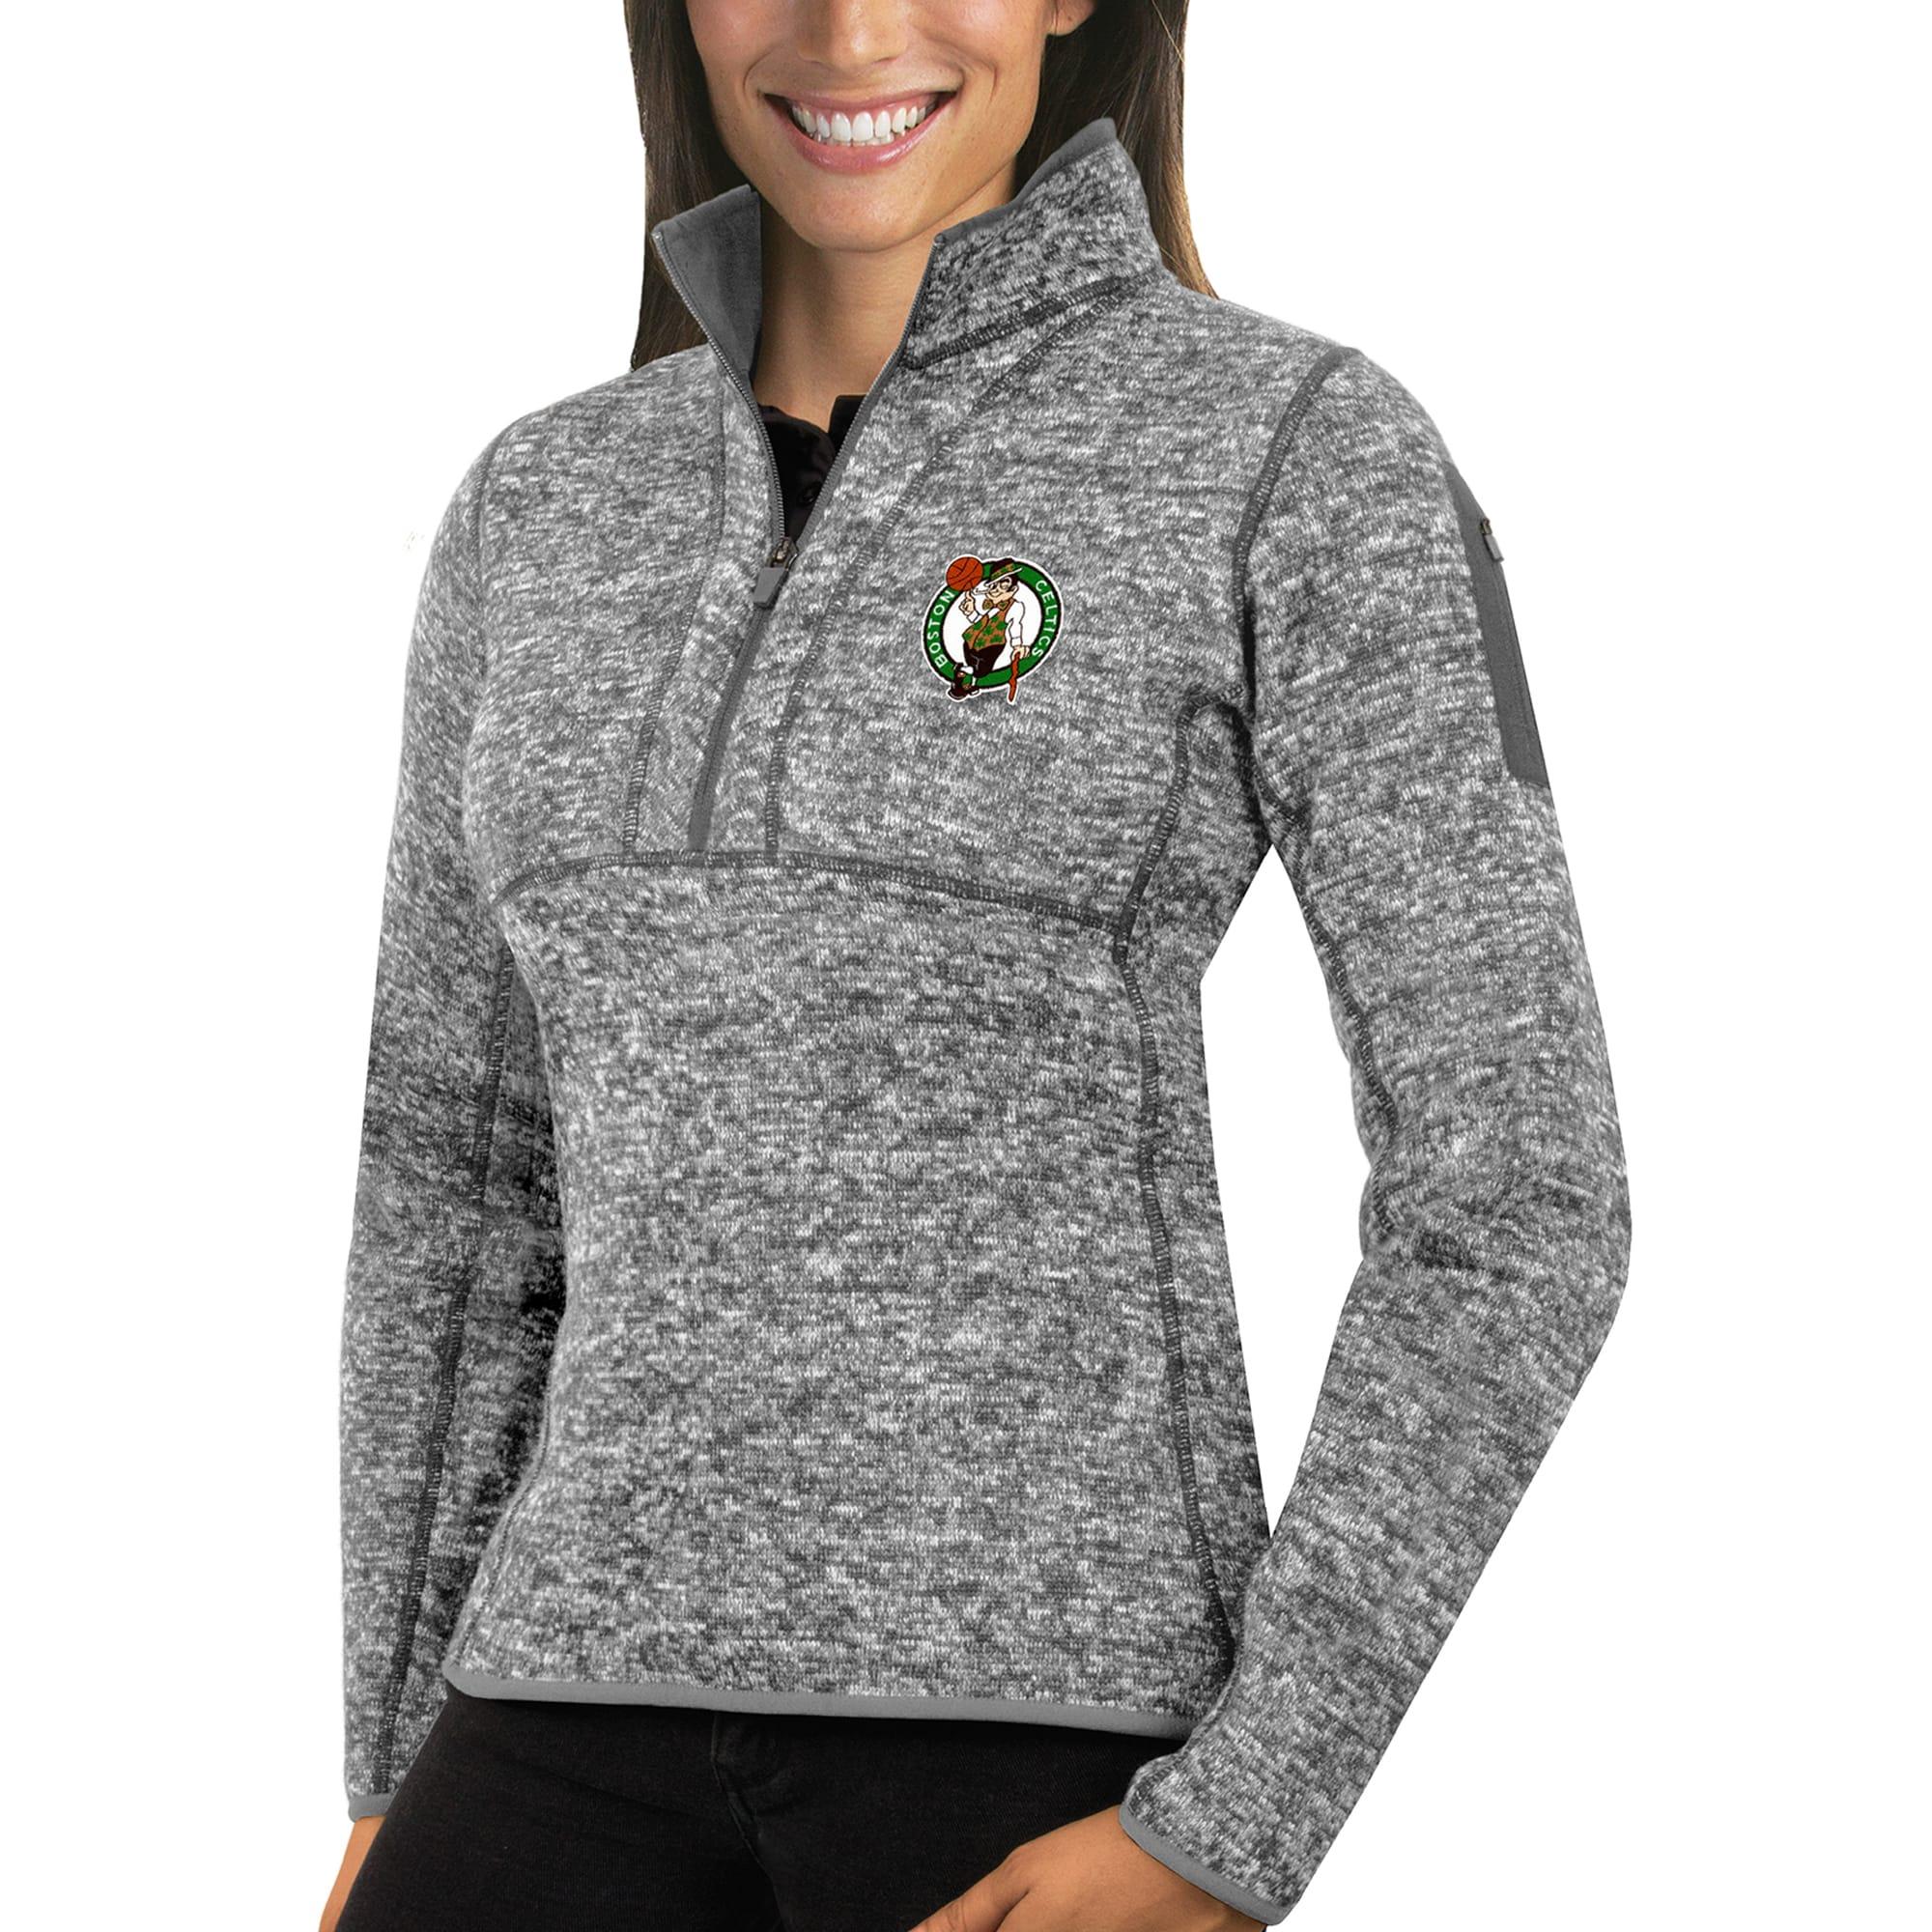 Boston Celtics Antigua Women's Fortune Half-Zip Pullover Jacket - Heather Gray